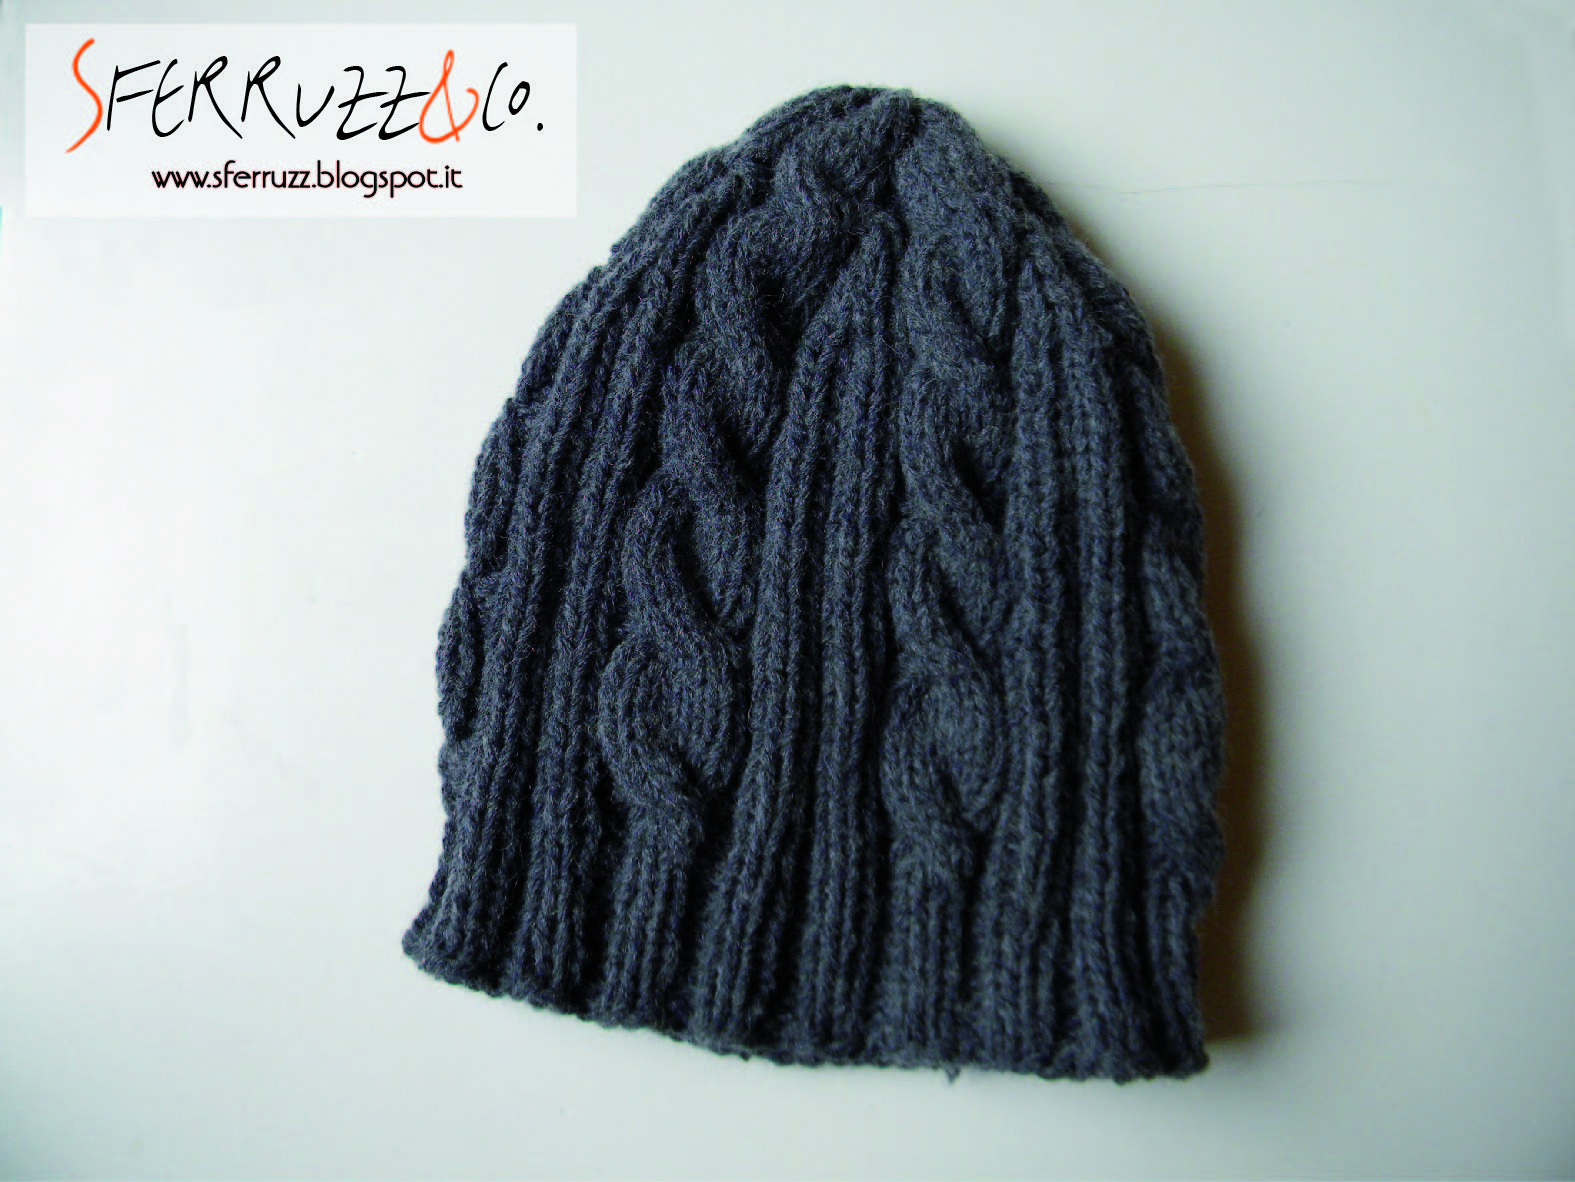 Cappelli di lana per uomo ai ferri – Acconciature medi 957354bf76b6